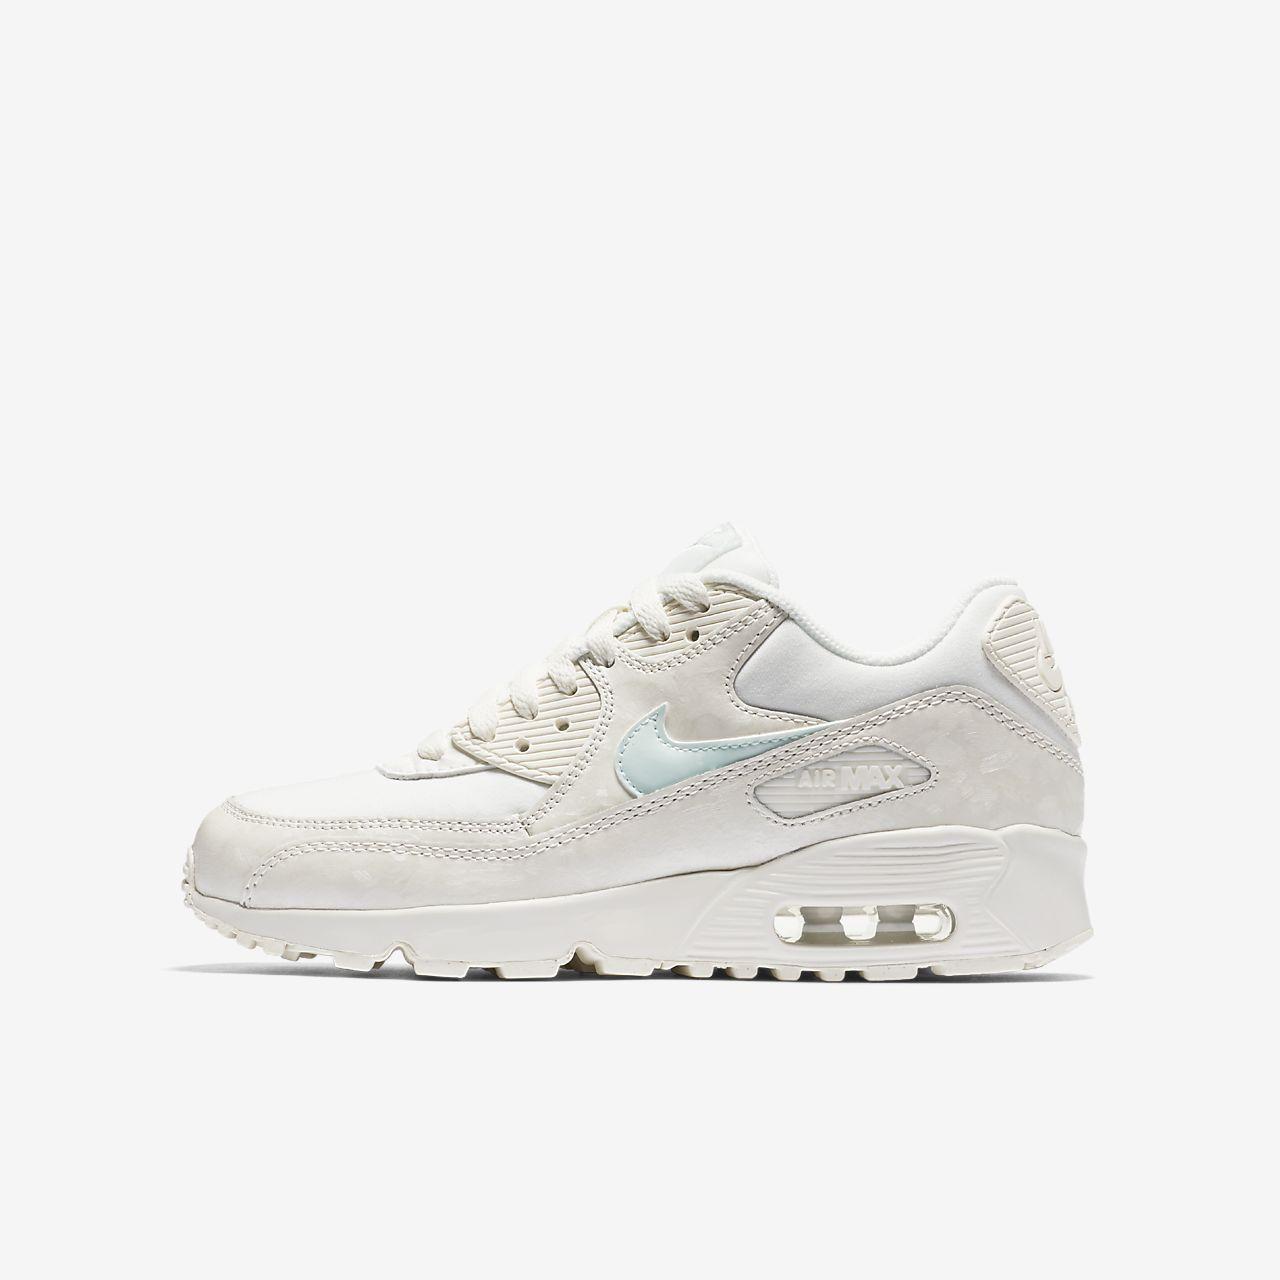 Manchester Nike Air Max 90 Grands Enfants Sacs À Dos Maille acheter en ligne sneakernews SQ1Jmsvvl